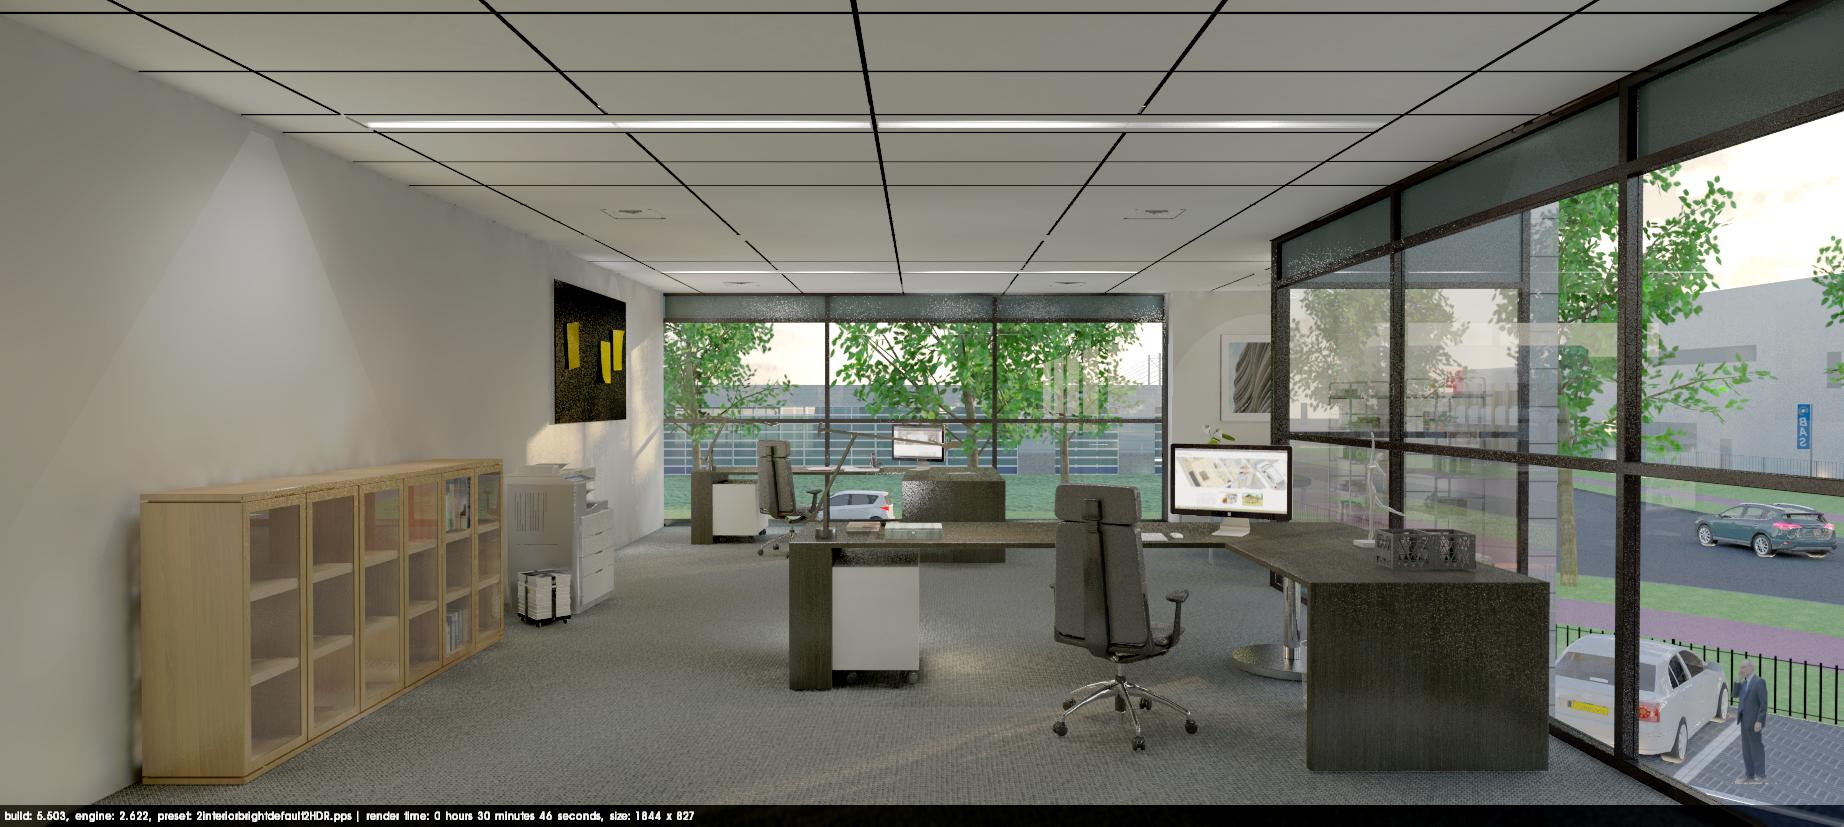 Interieur-office-v8 2018-11-07.png